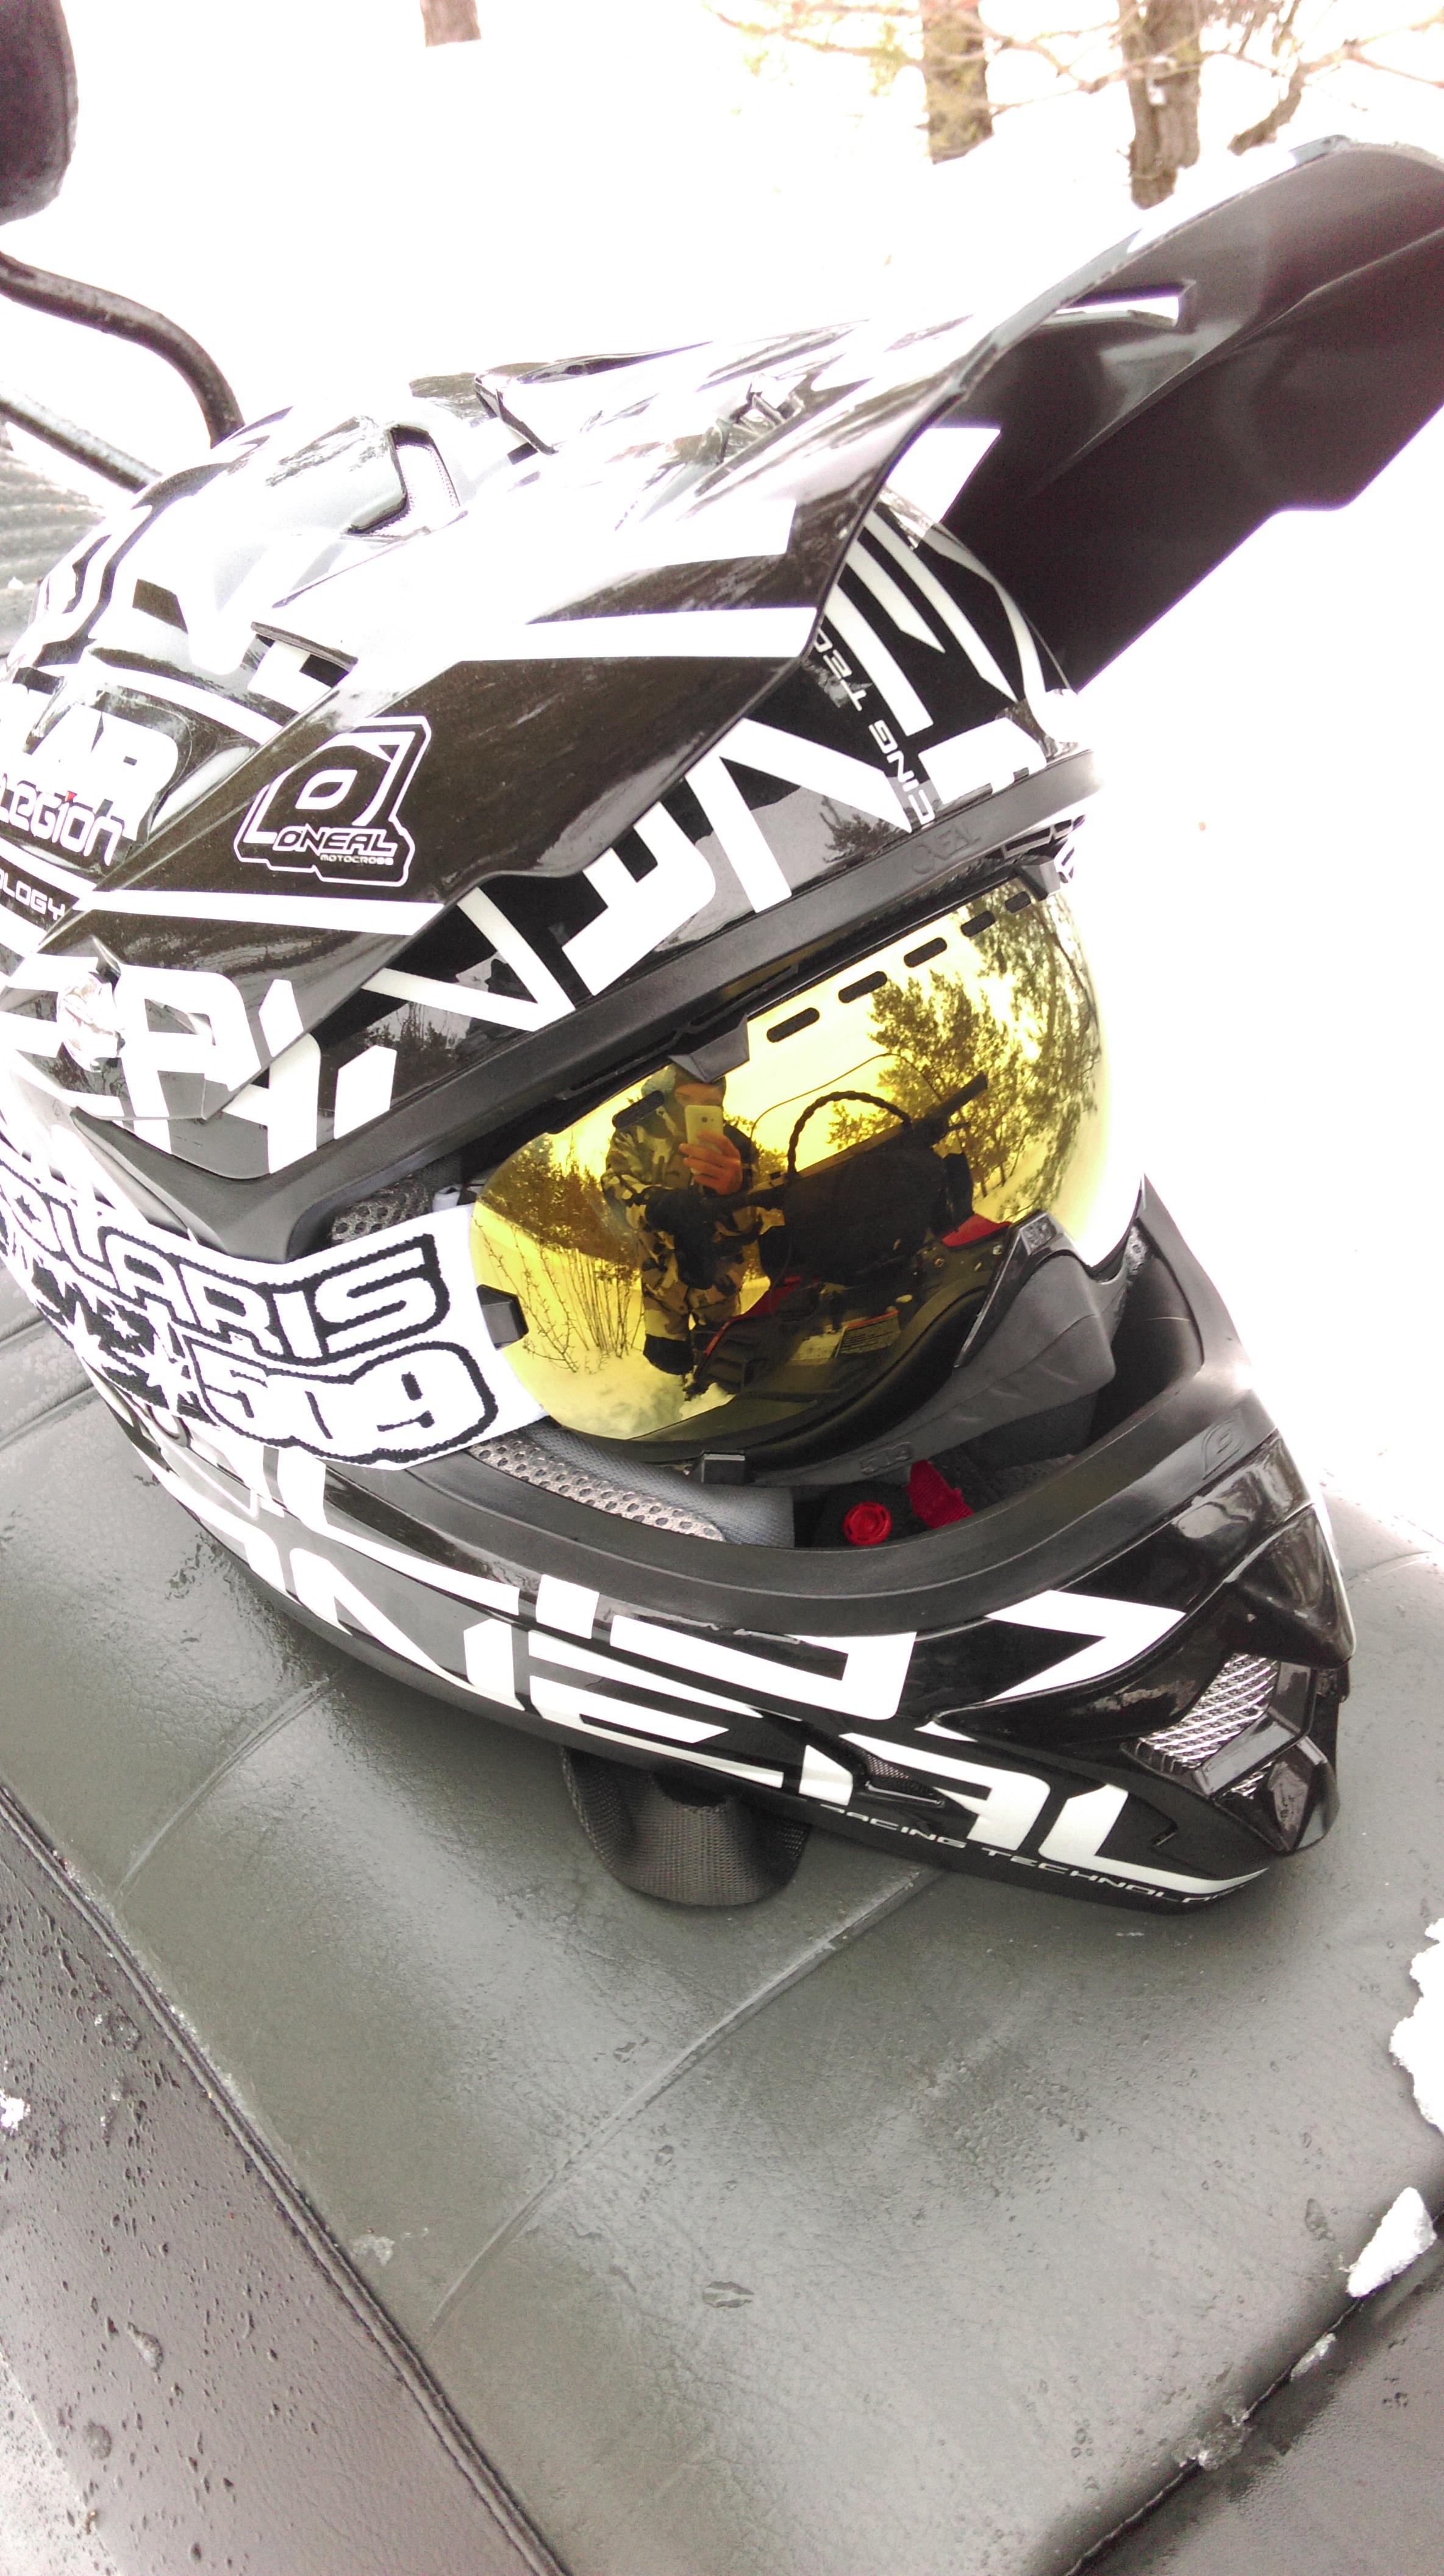 44b08af714e9 Продам шлем oneal и очки 509 aviator   WWW.SNOWMOBILE.RU ...